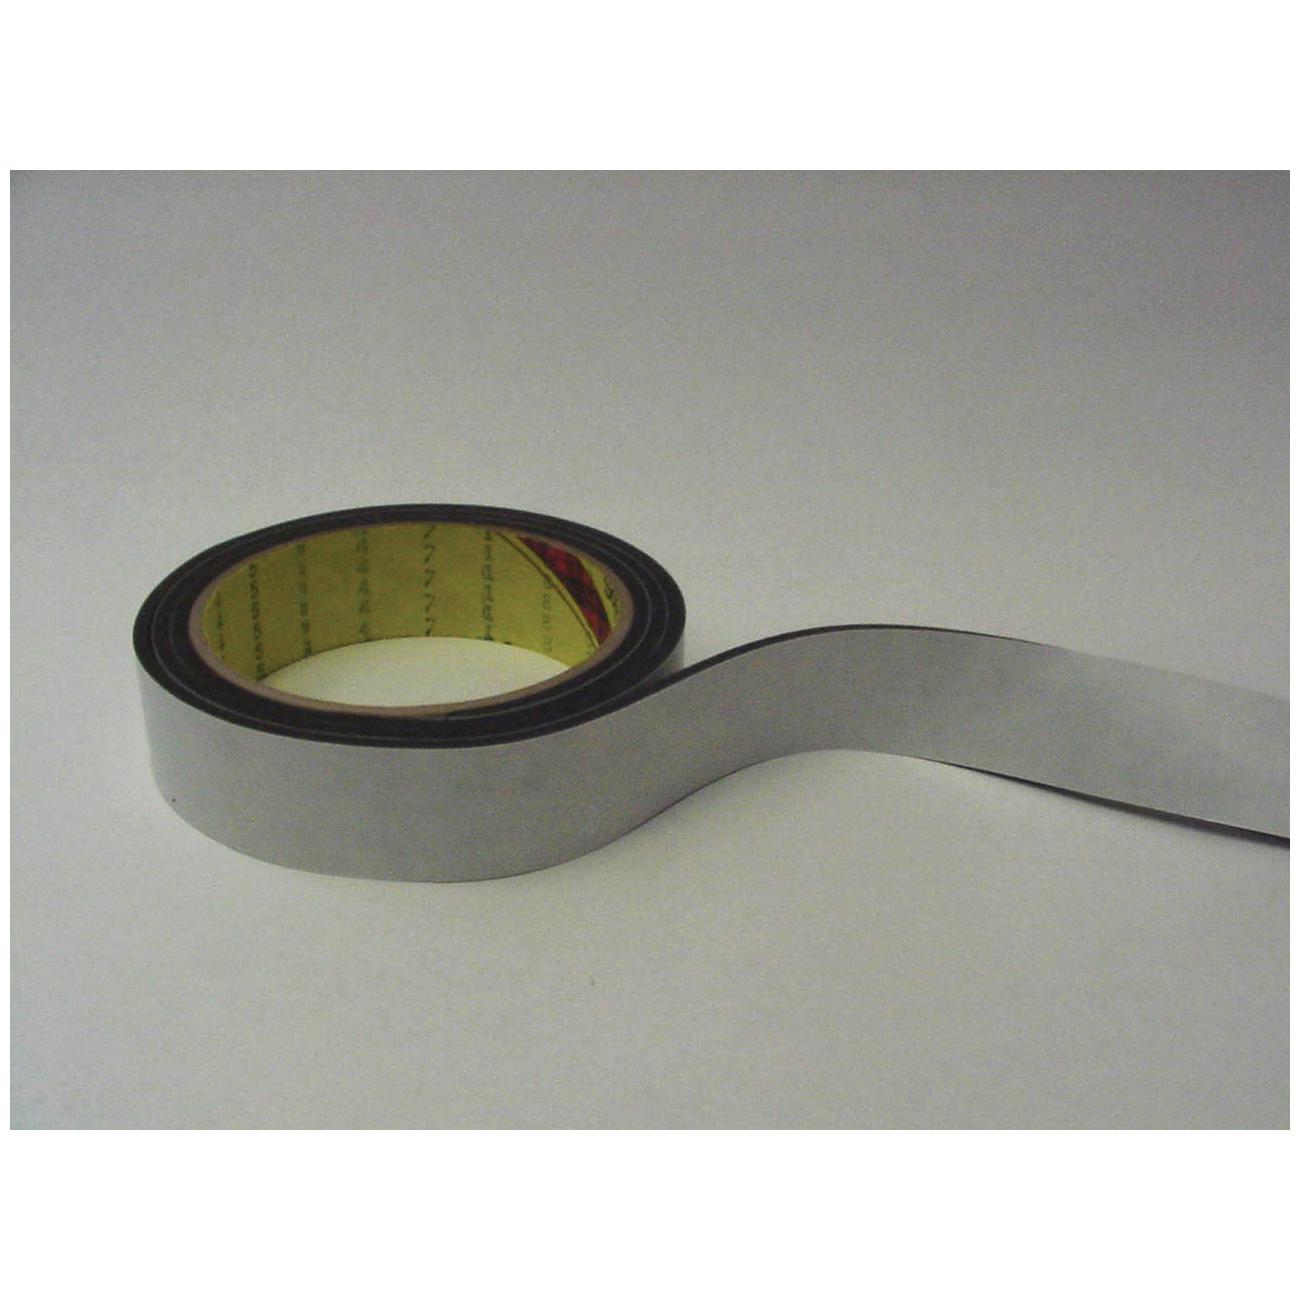 3M™ 021200-86292 4718 Single Coated Foam Tape, 36 yd L x 1/4 in W, 125 mil THK, Acrylic Adhesive, Vinyl Foam Backing, Black